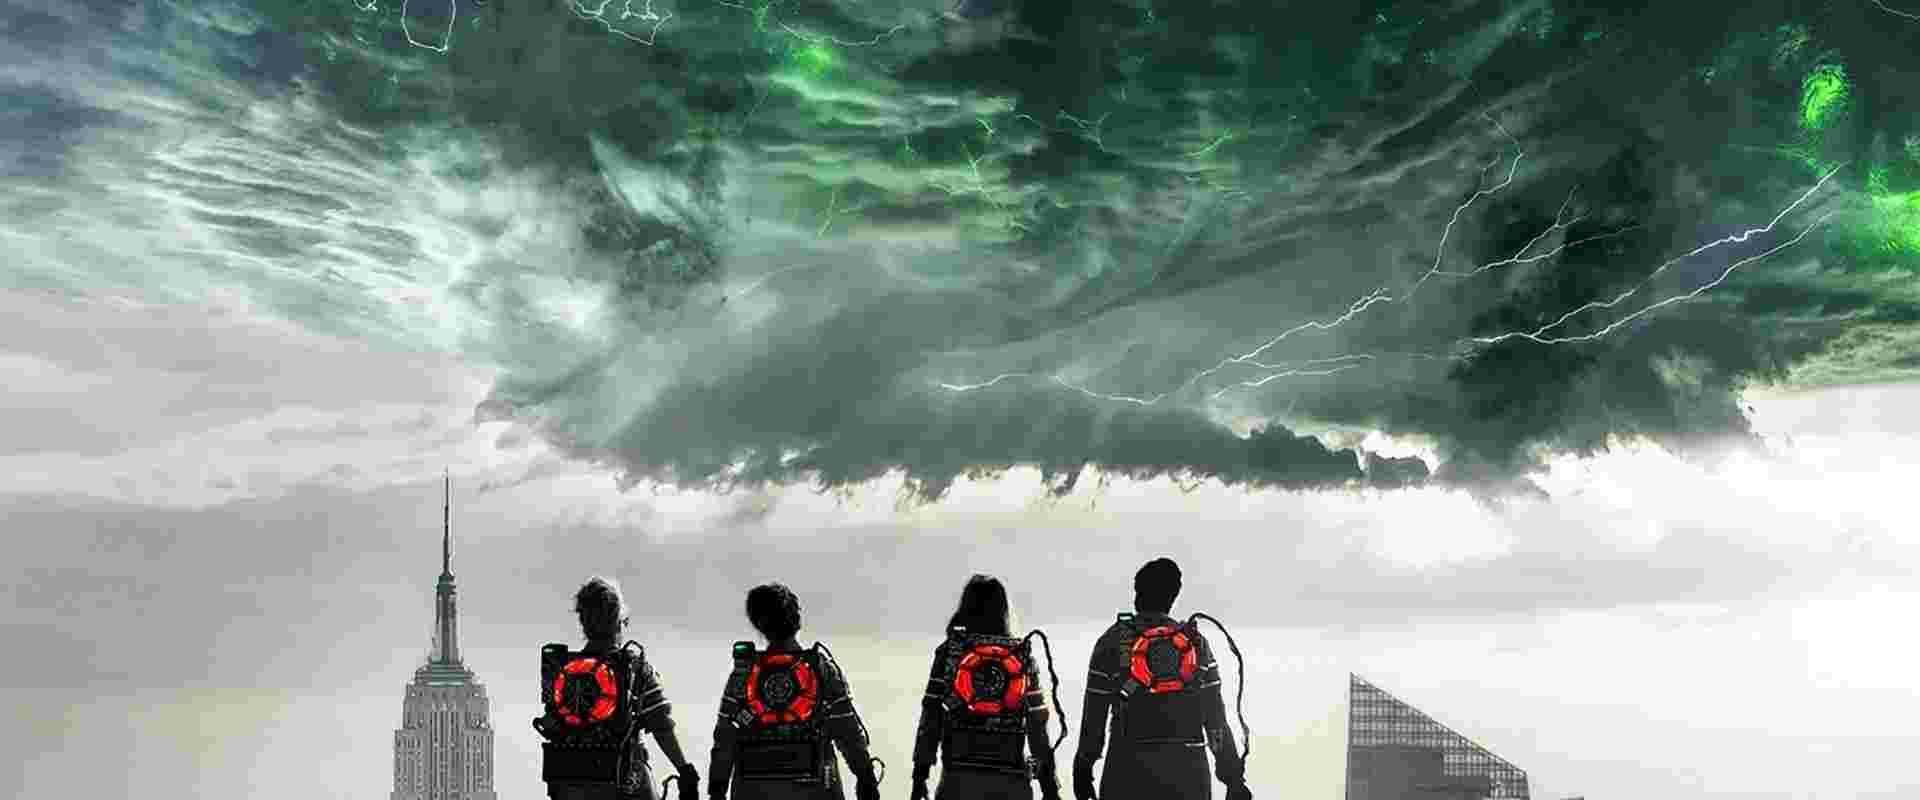 ghostbusters-wallpaper-movie-2016